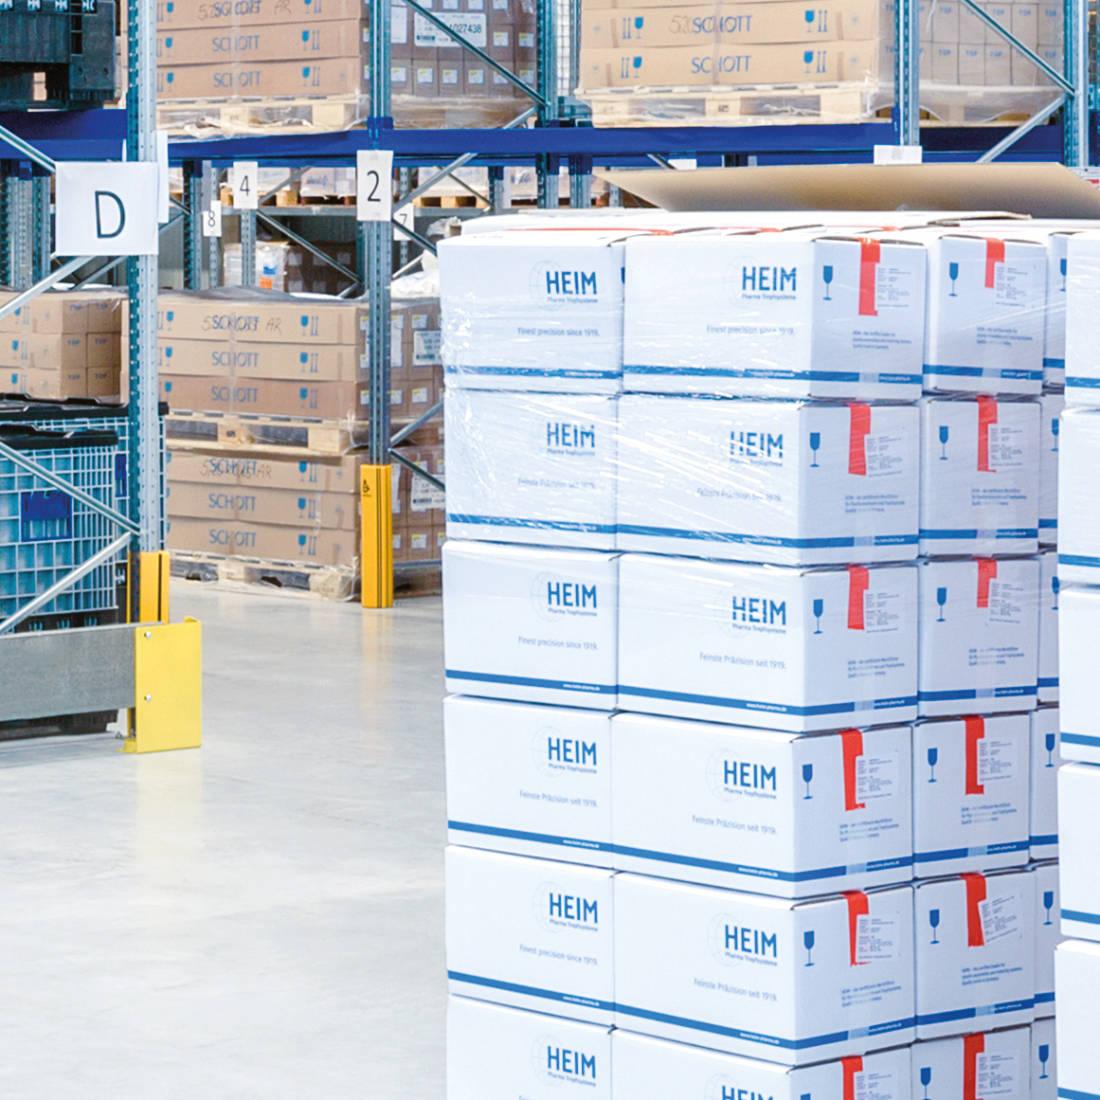 HEIM warehouse